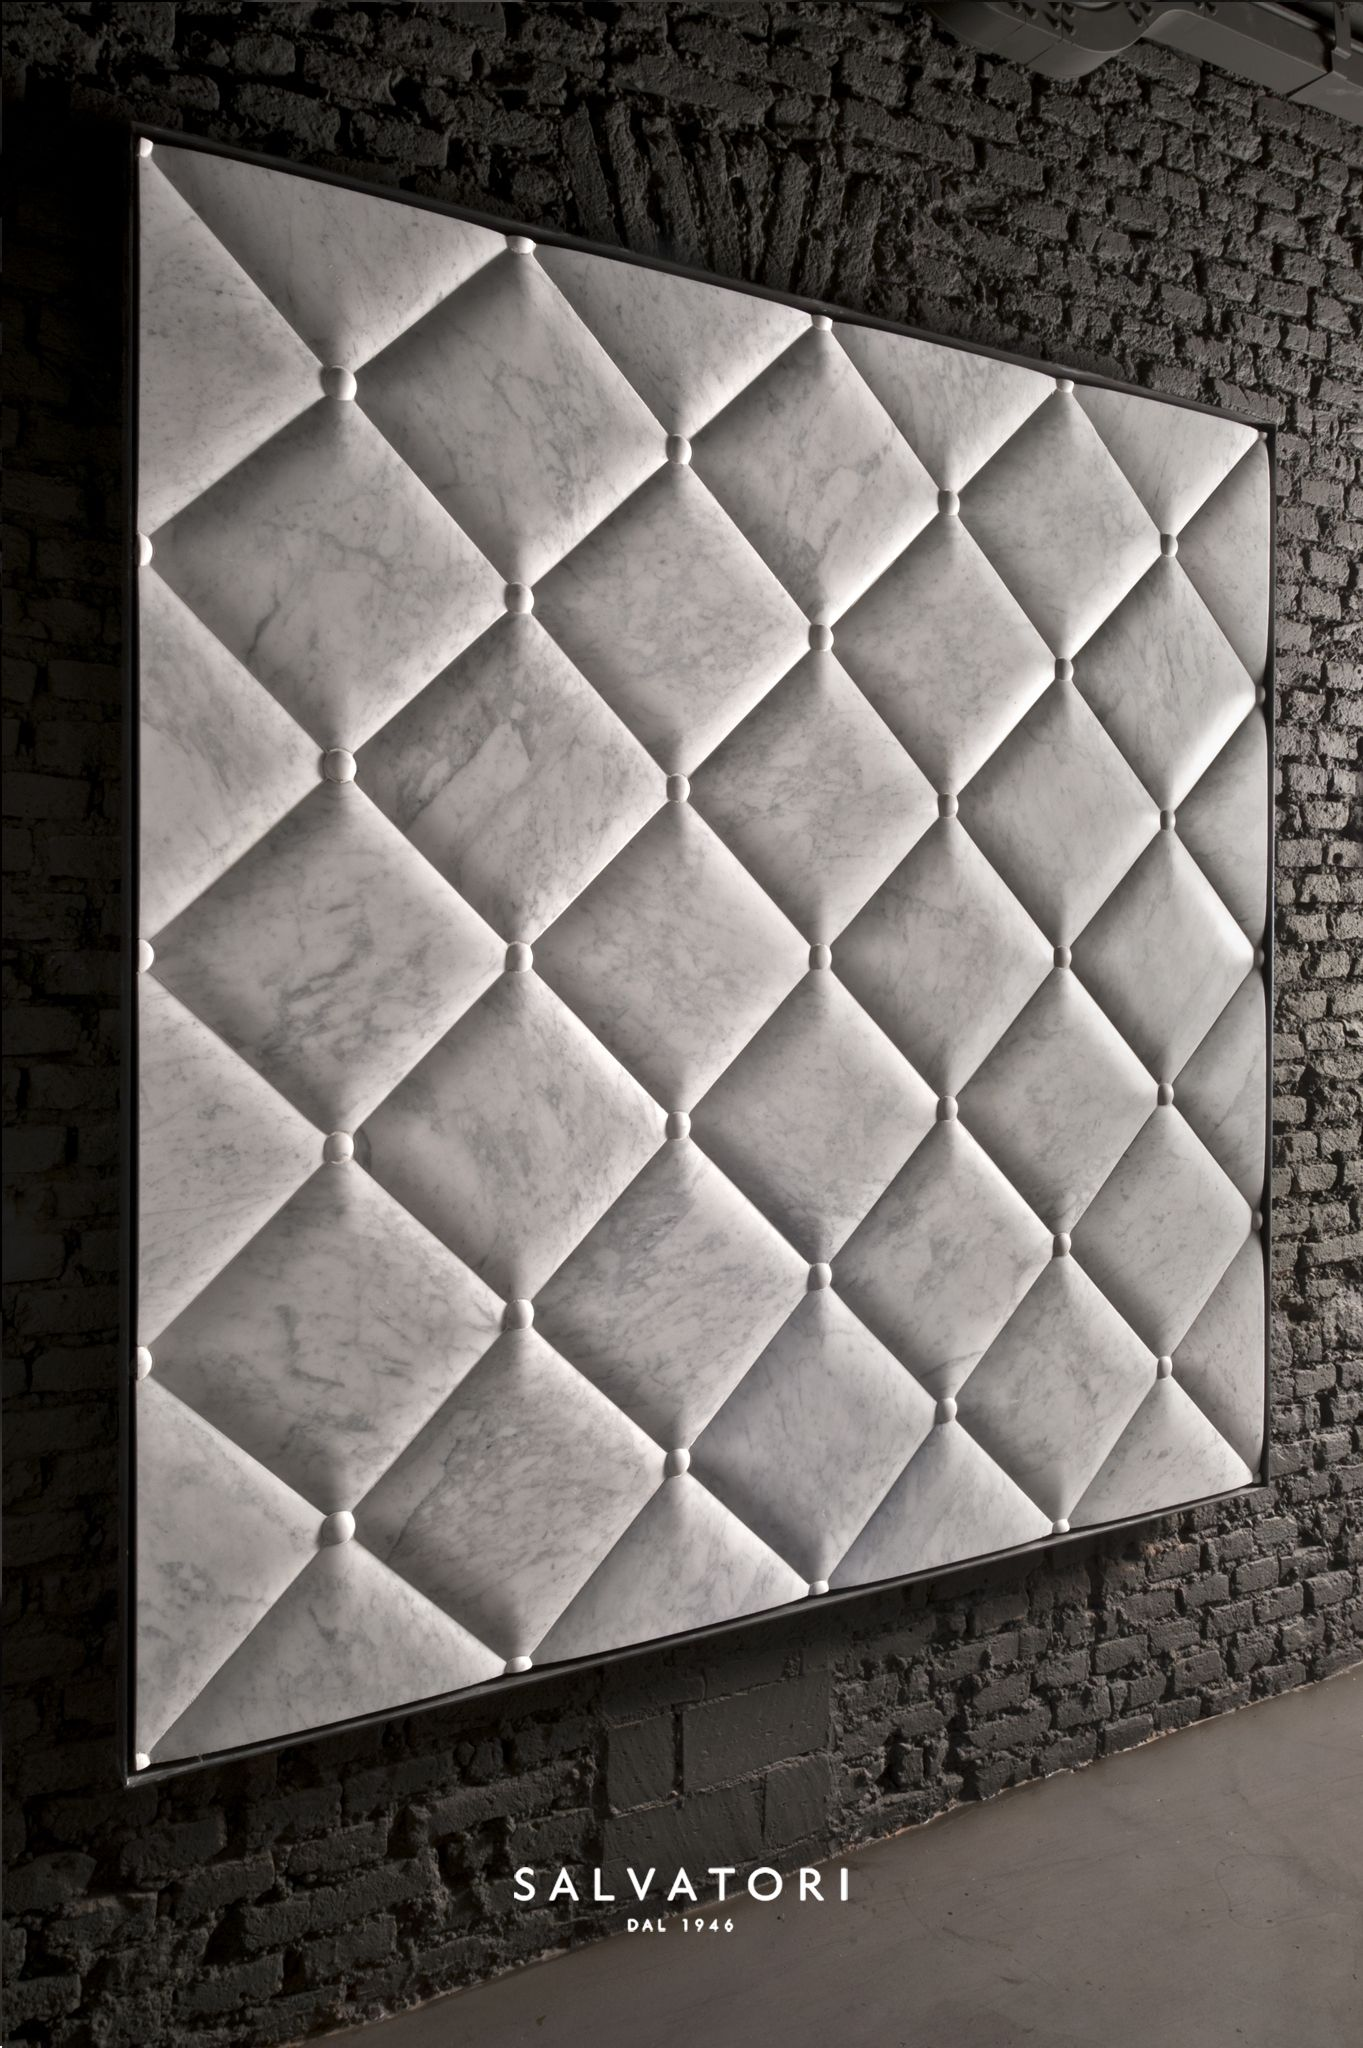 Cuscini Re Garden.Cuscini Wall Cladding Wall Cladding Designs